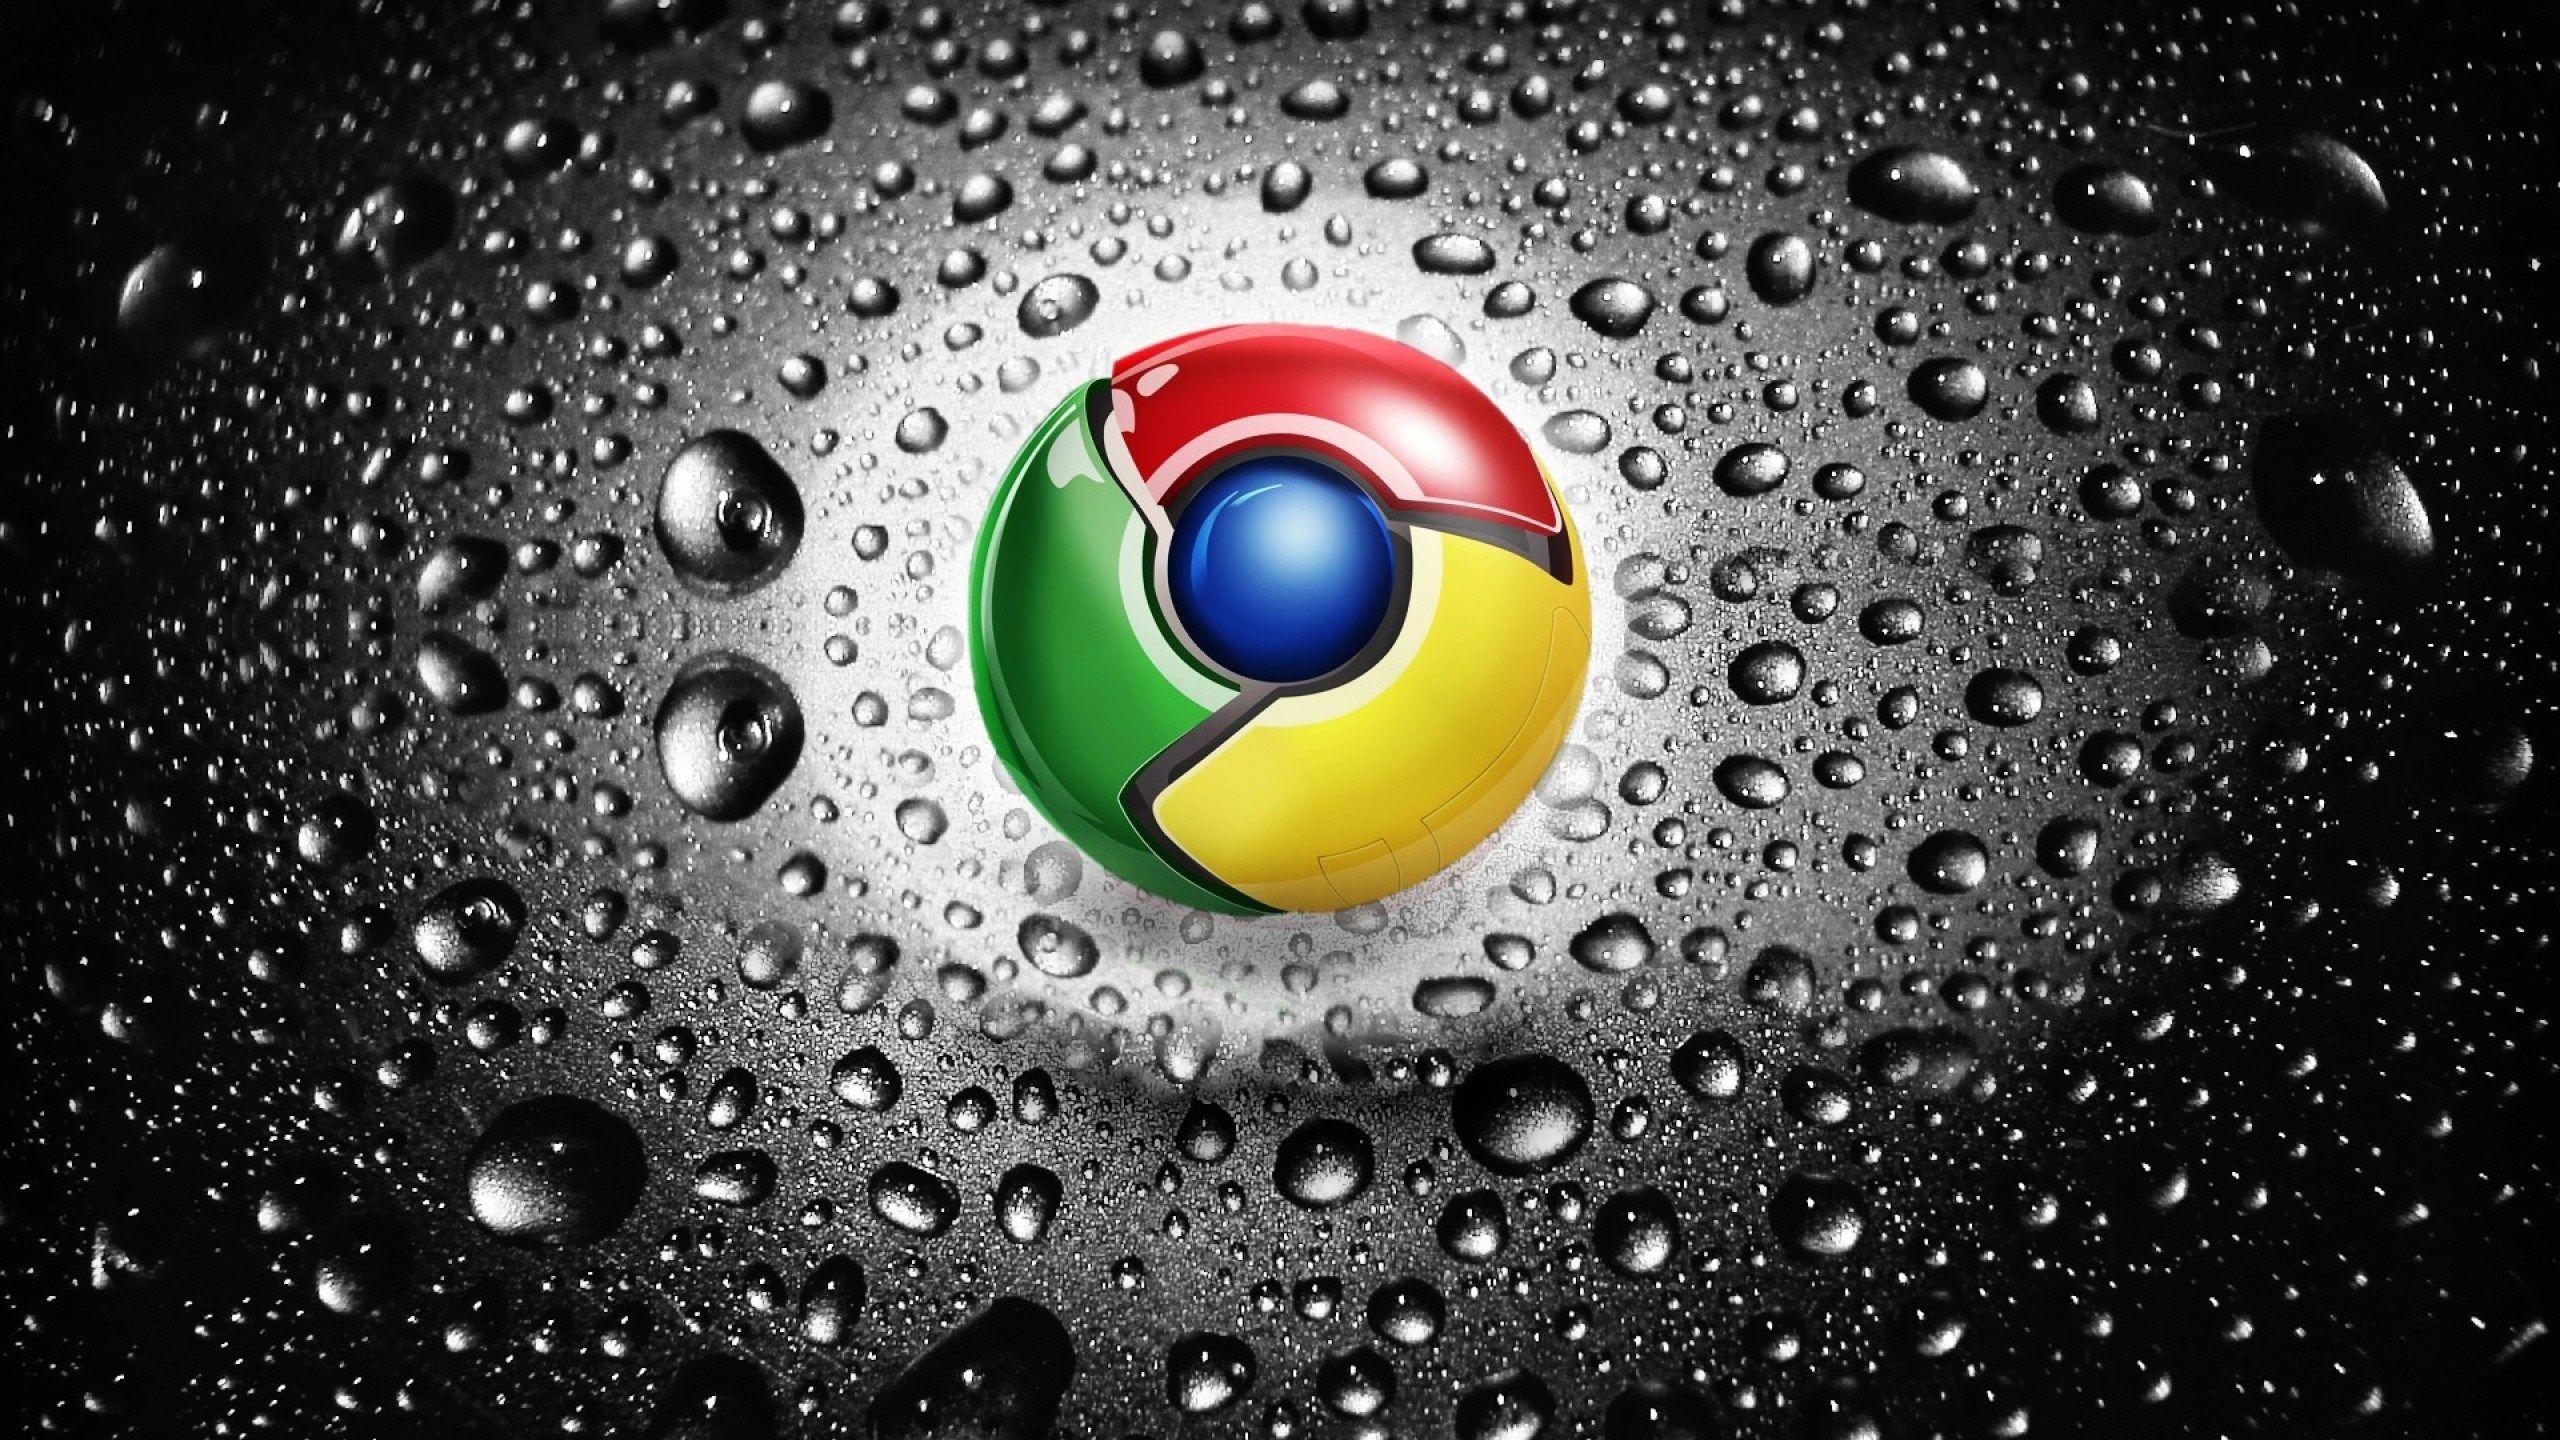 2560x1440 Image For Desktop Google Chrome Google Wallpaper Hd Black Wallpaper Iphone Chrome